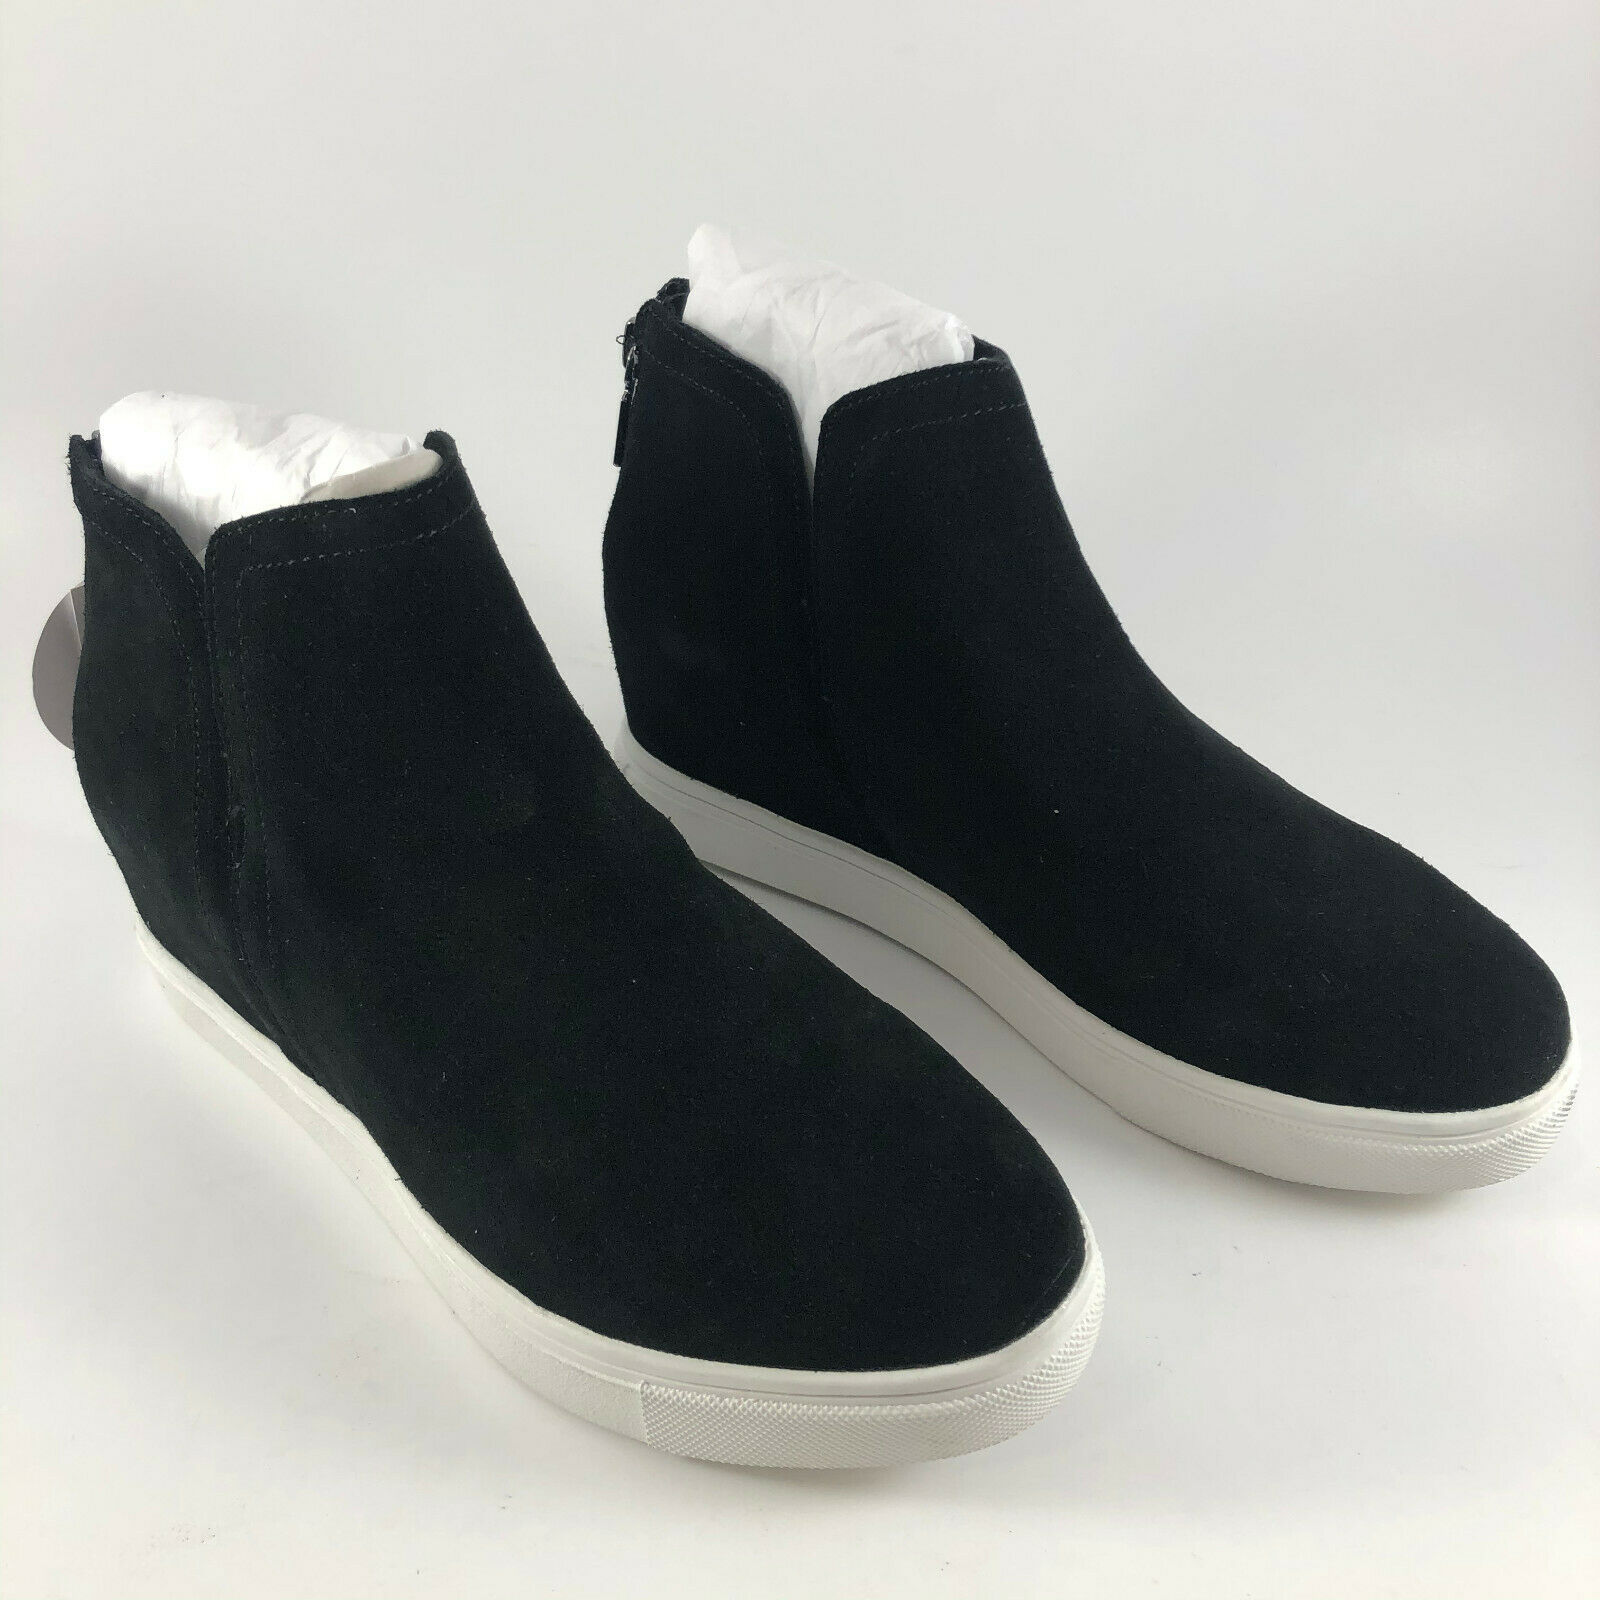 Blondo Women's GENNA Wedge Sneaker Black Suede Leather - Size 7